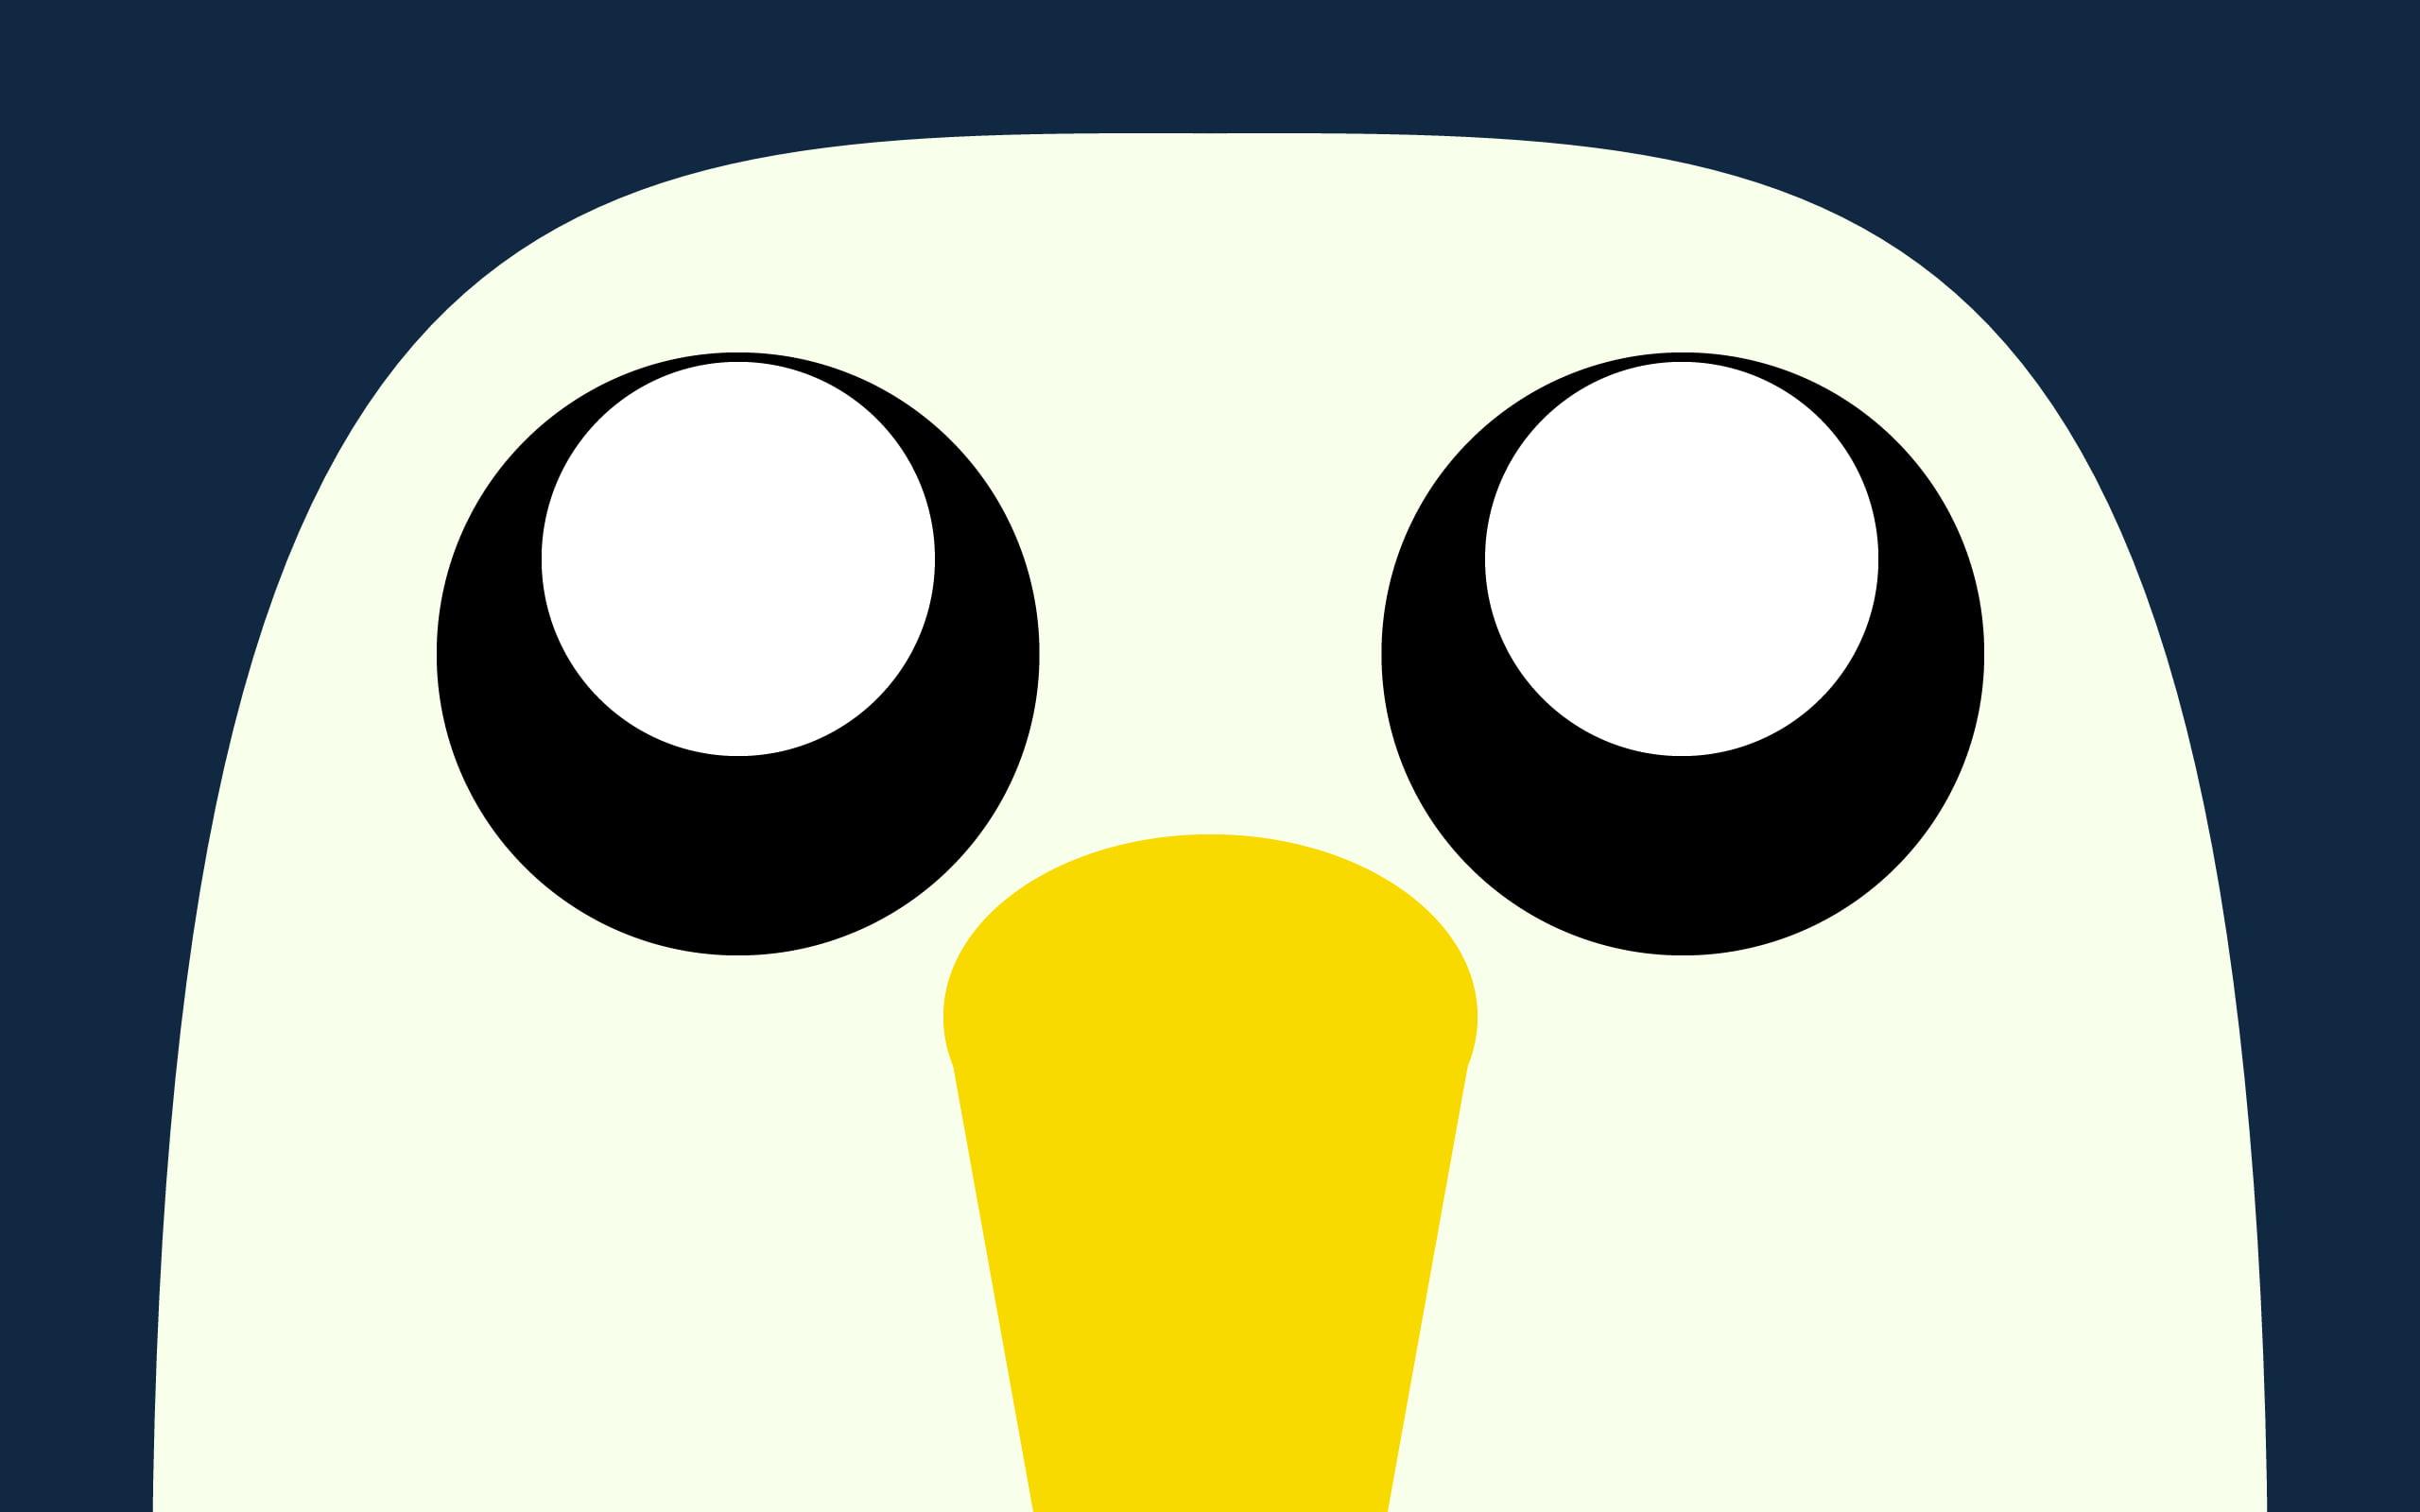 Penguin logo Adventure Time Gunter HD wallpaper Wallpaper Flare 2560x1600